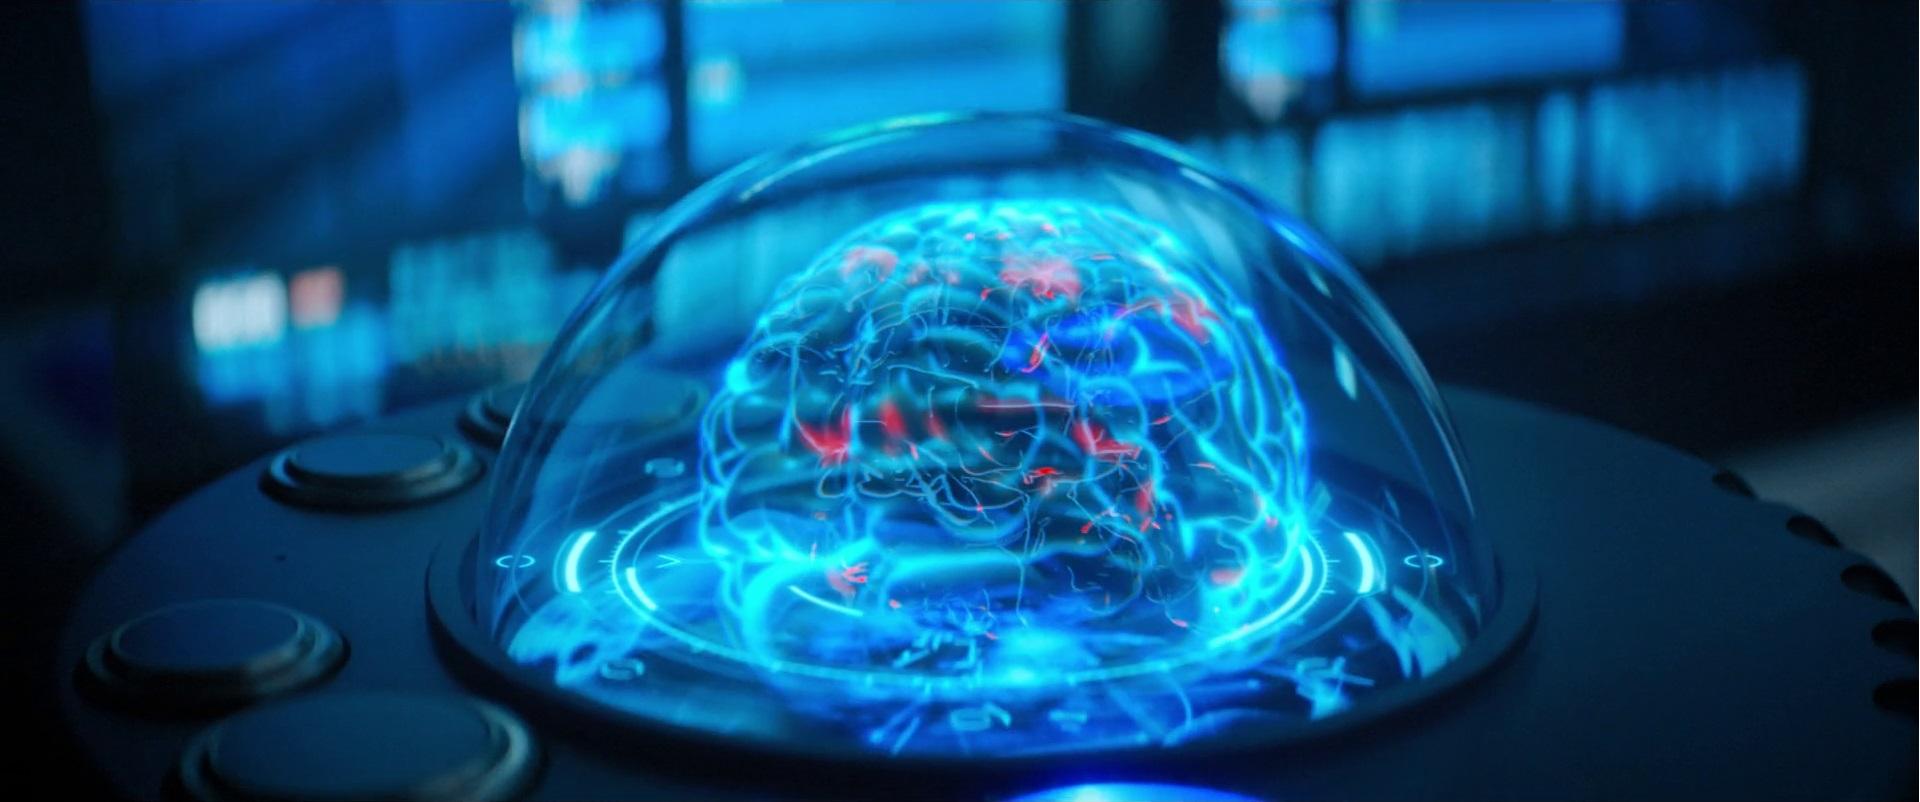 Cerebral mapping